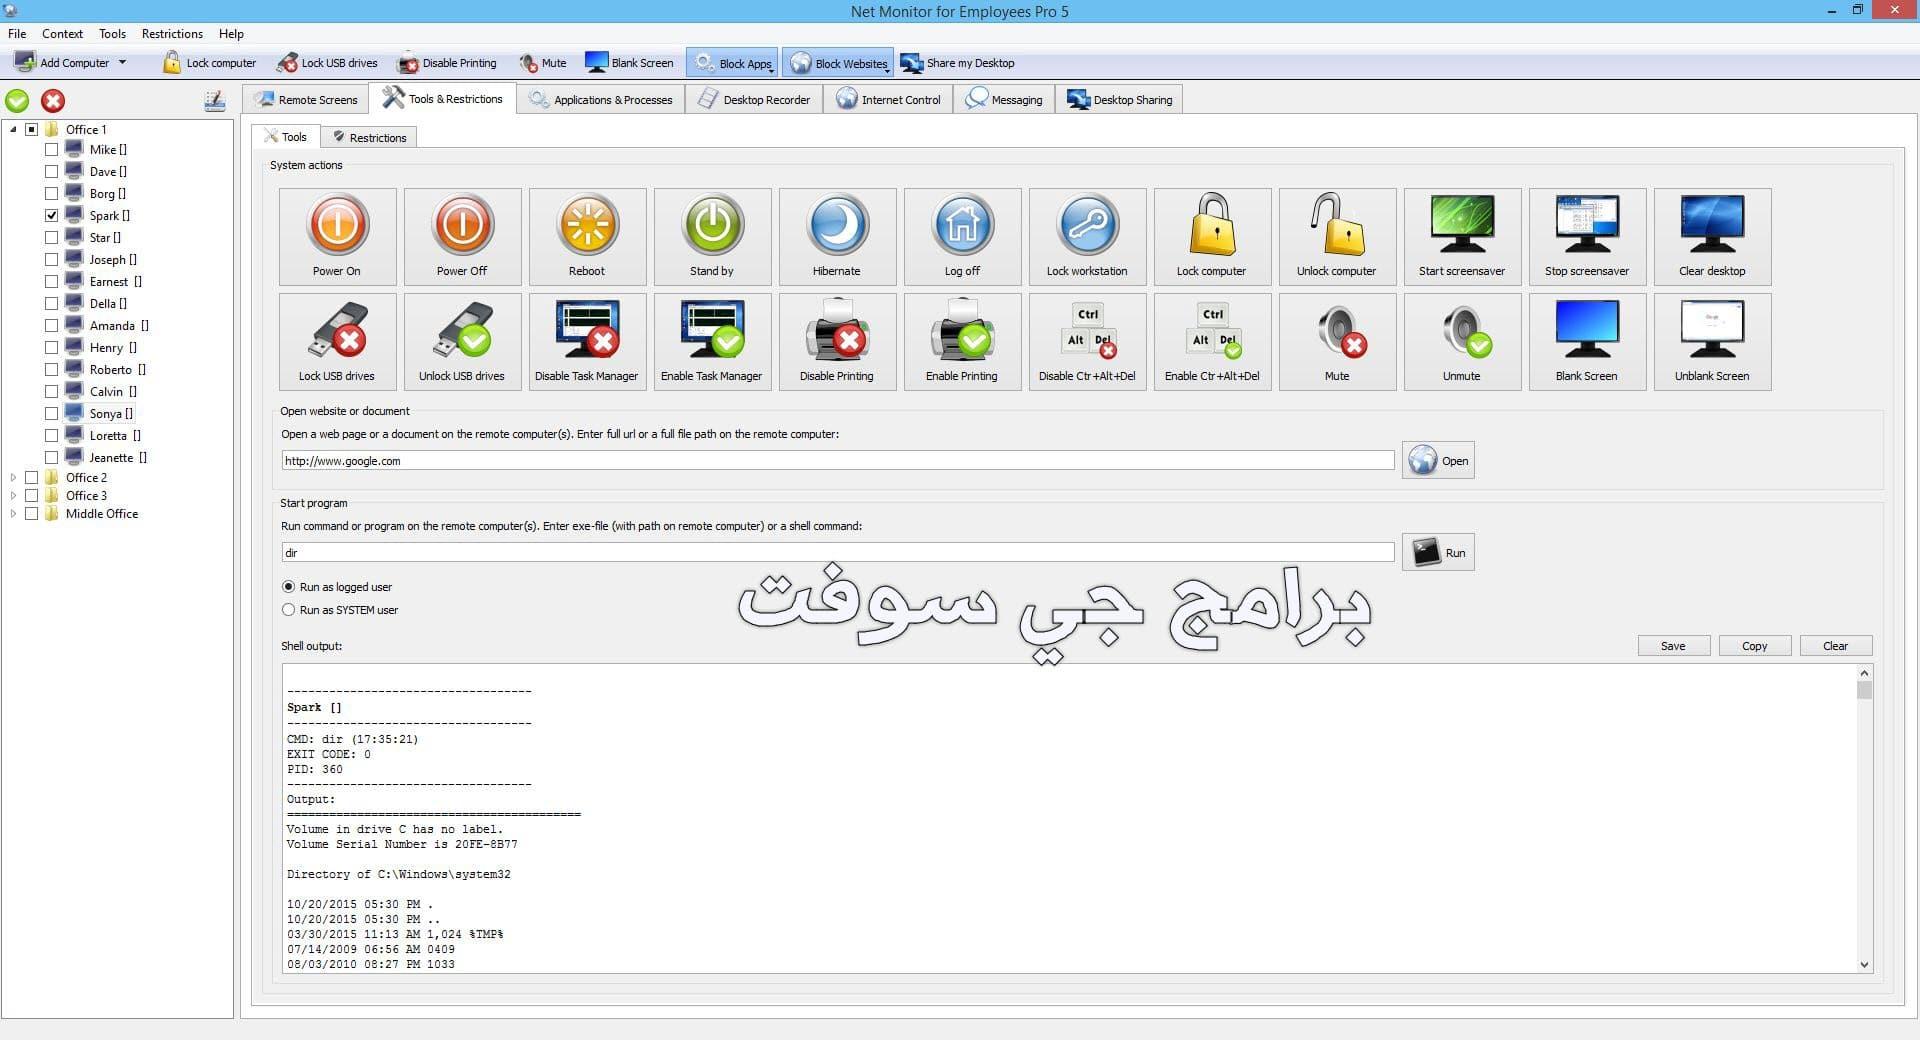 Net Monitor for Employees Pro برنامج ريموت كنترول